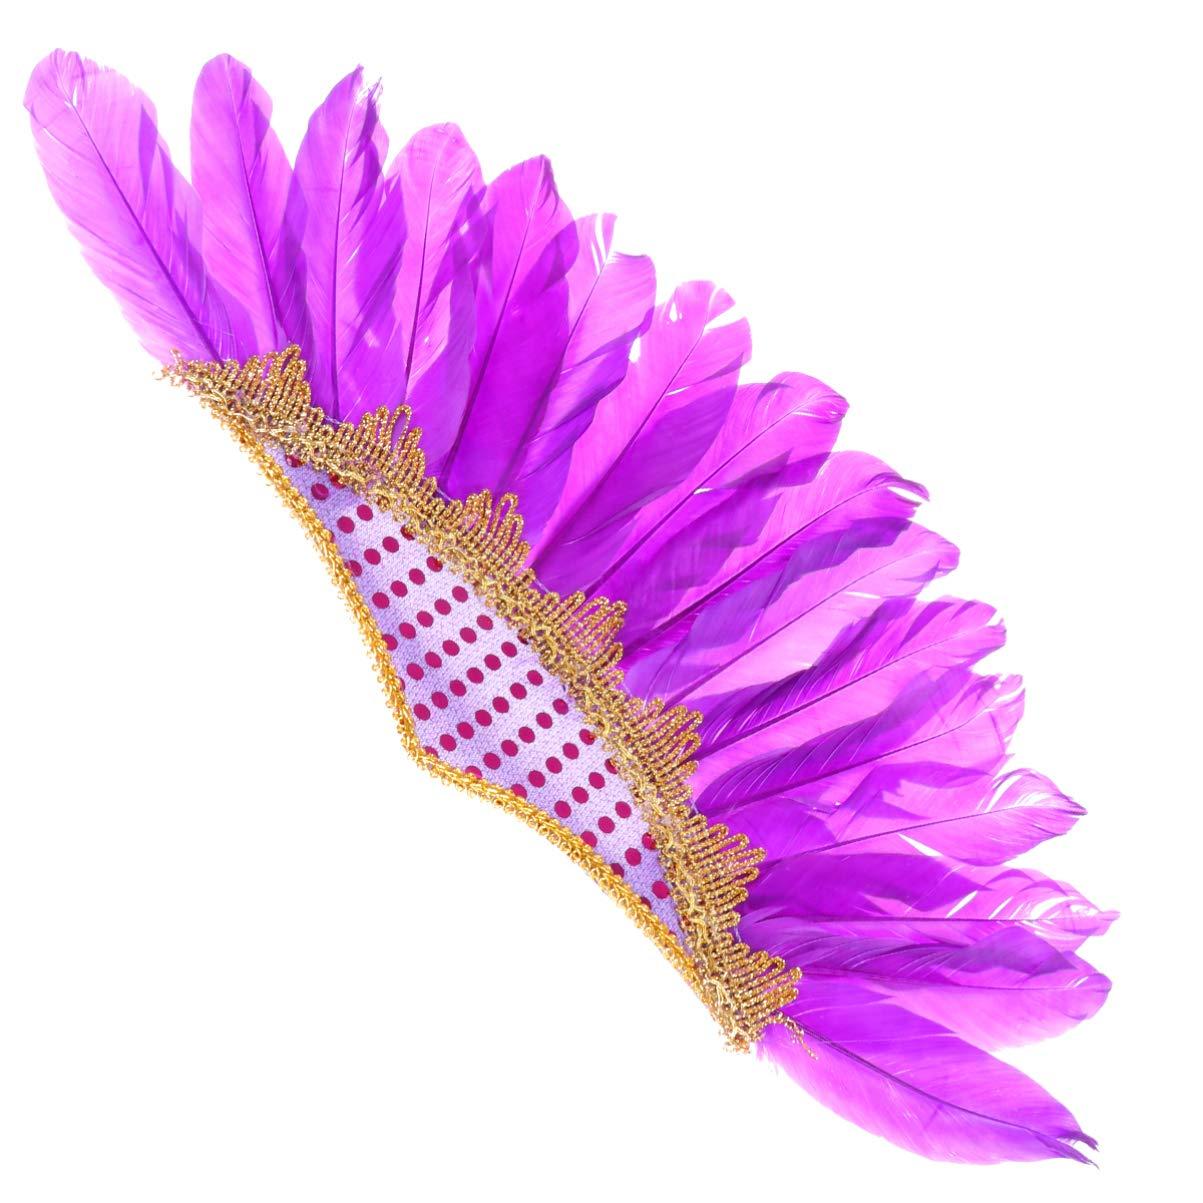 Amosfun Feather Headband Boho Gypsy Performance Hair Accessories Women Men Adults Average Size Violet